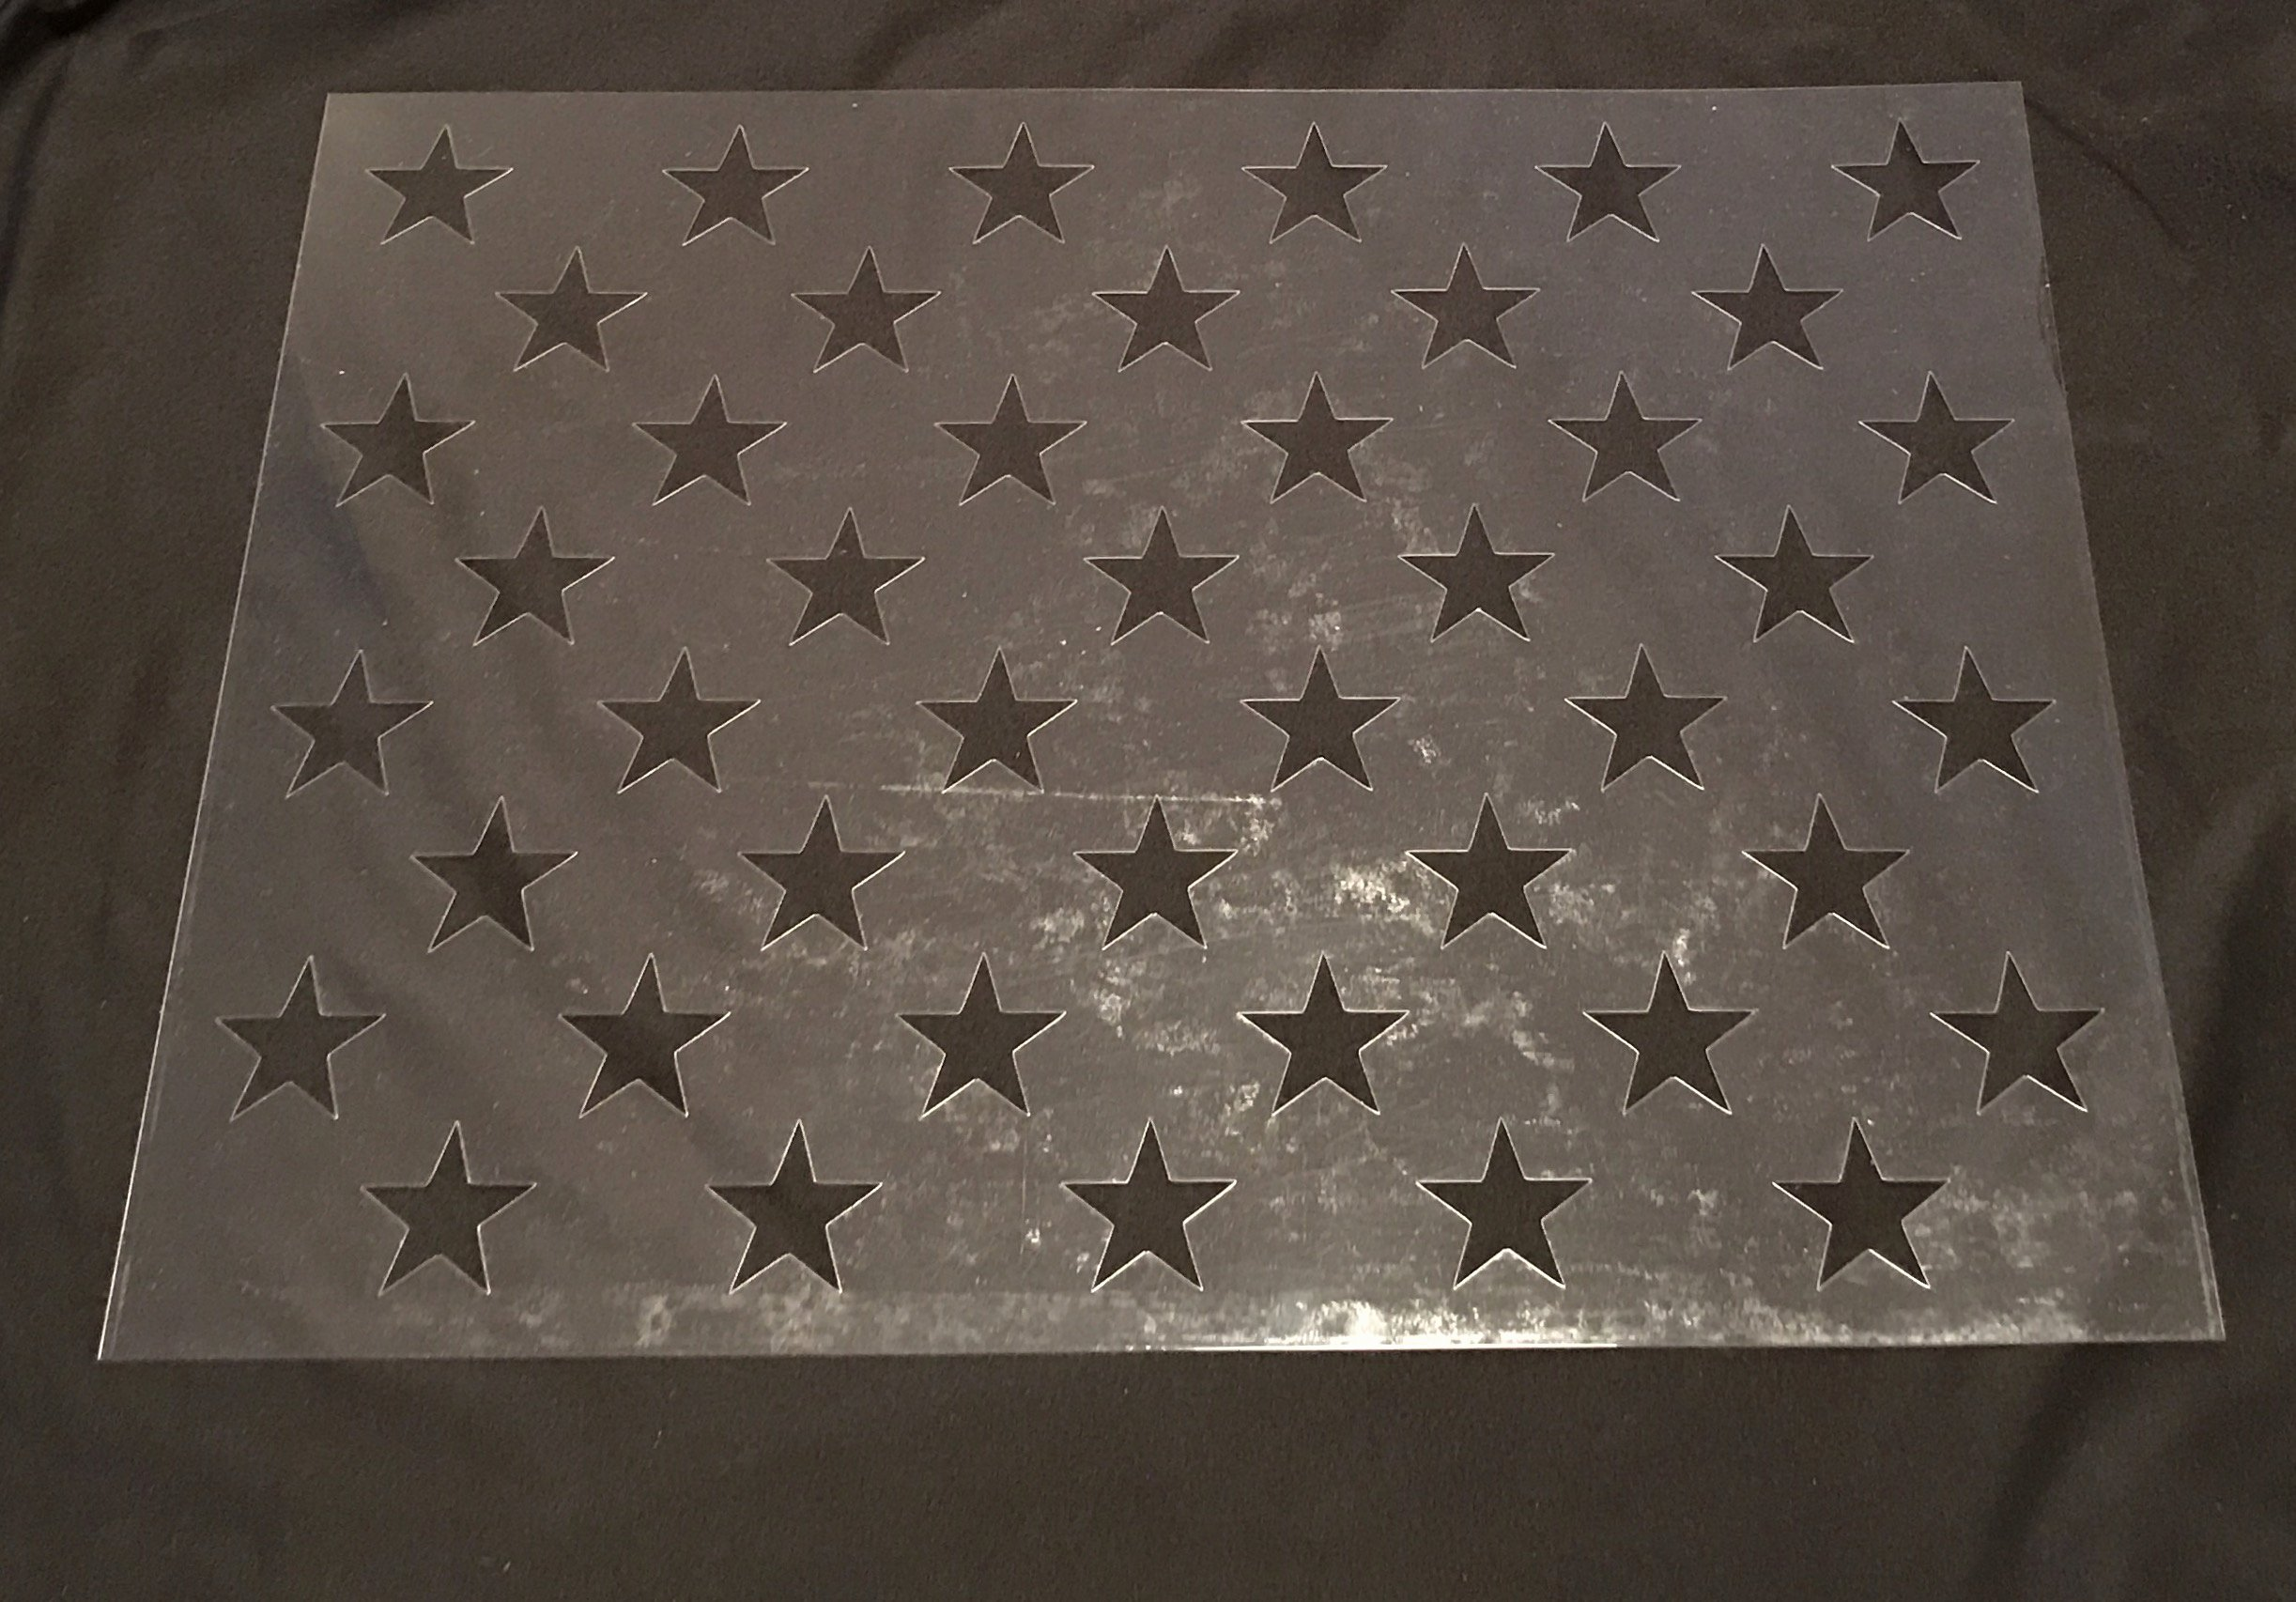 Flag Star Stencil Best Of Small 50 Star Stencil the Furrminator